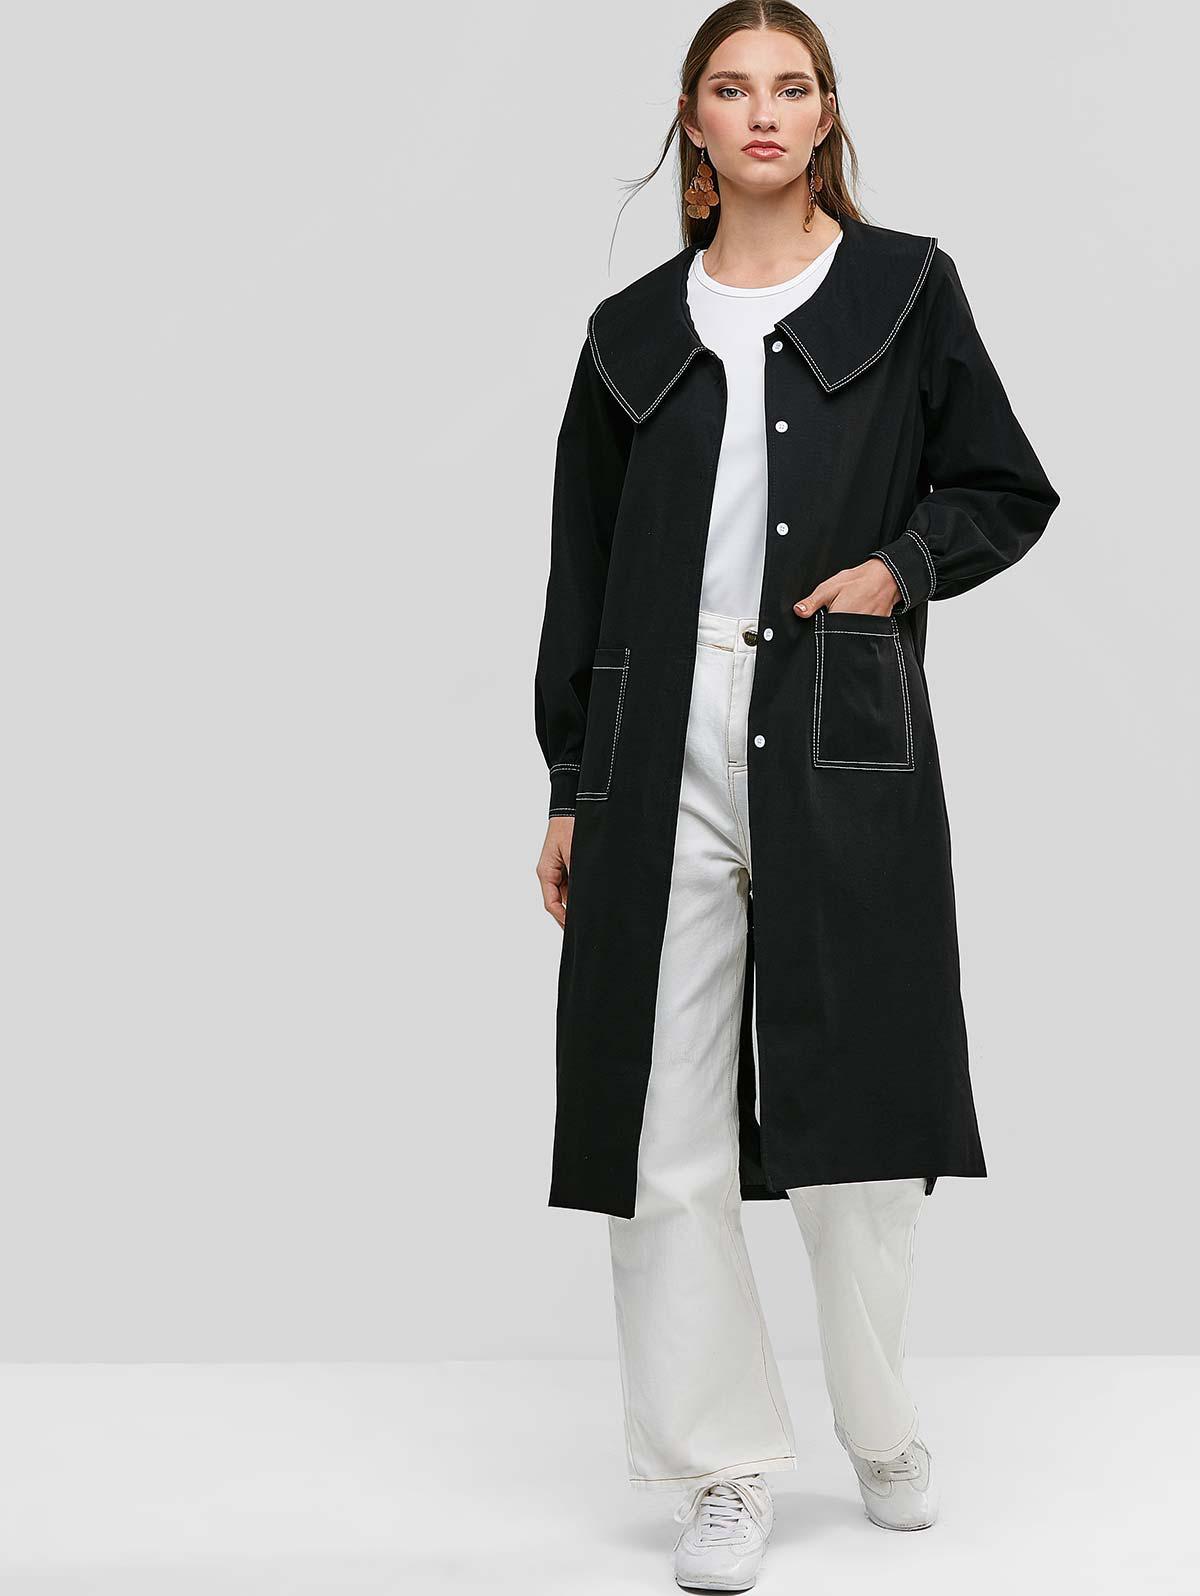 Button Up Patched Pockets Side Slit Longline Coat